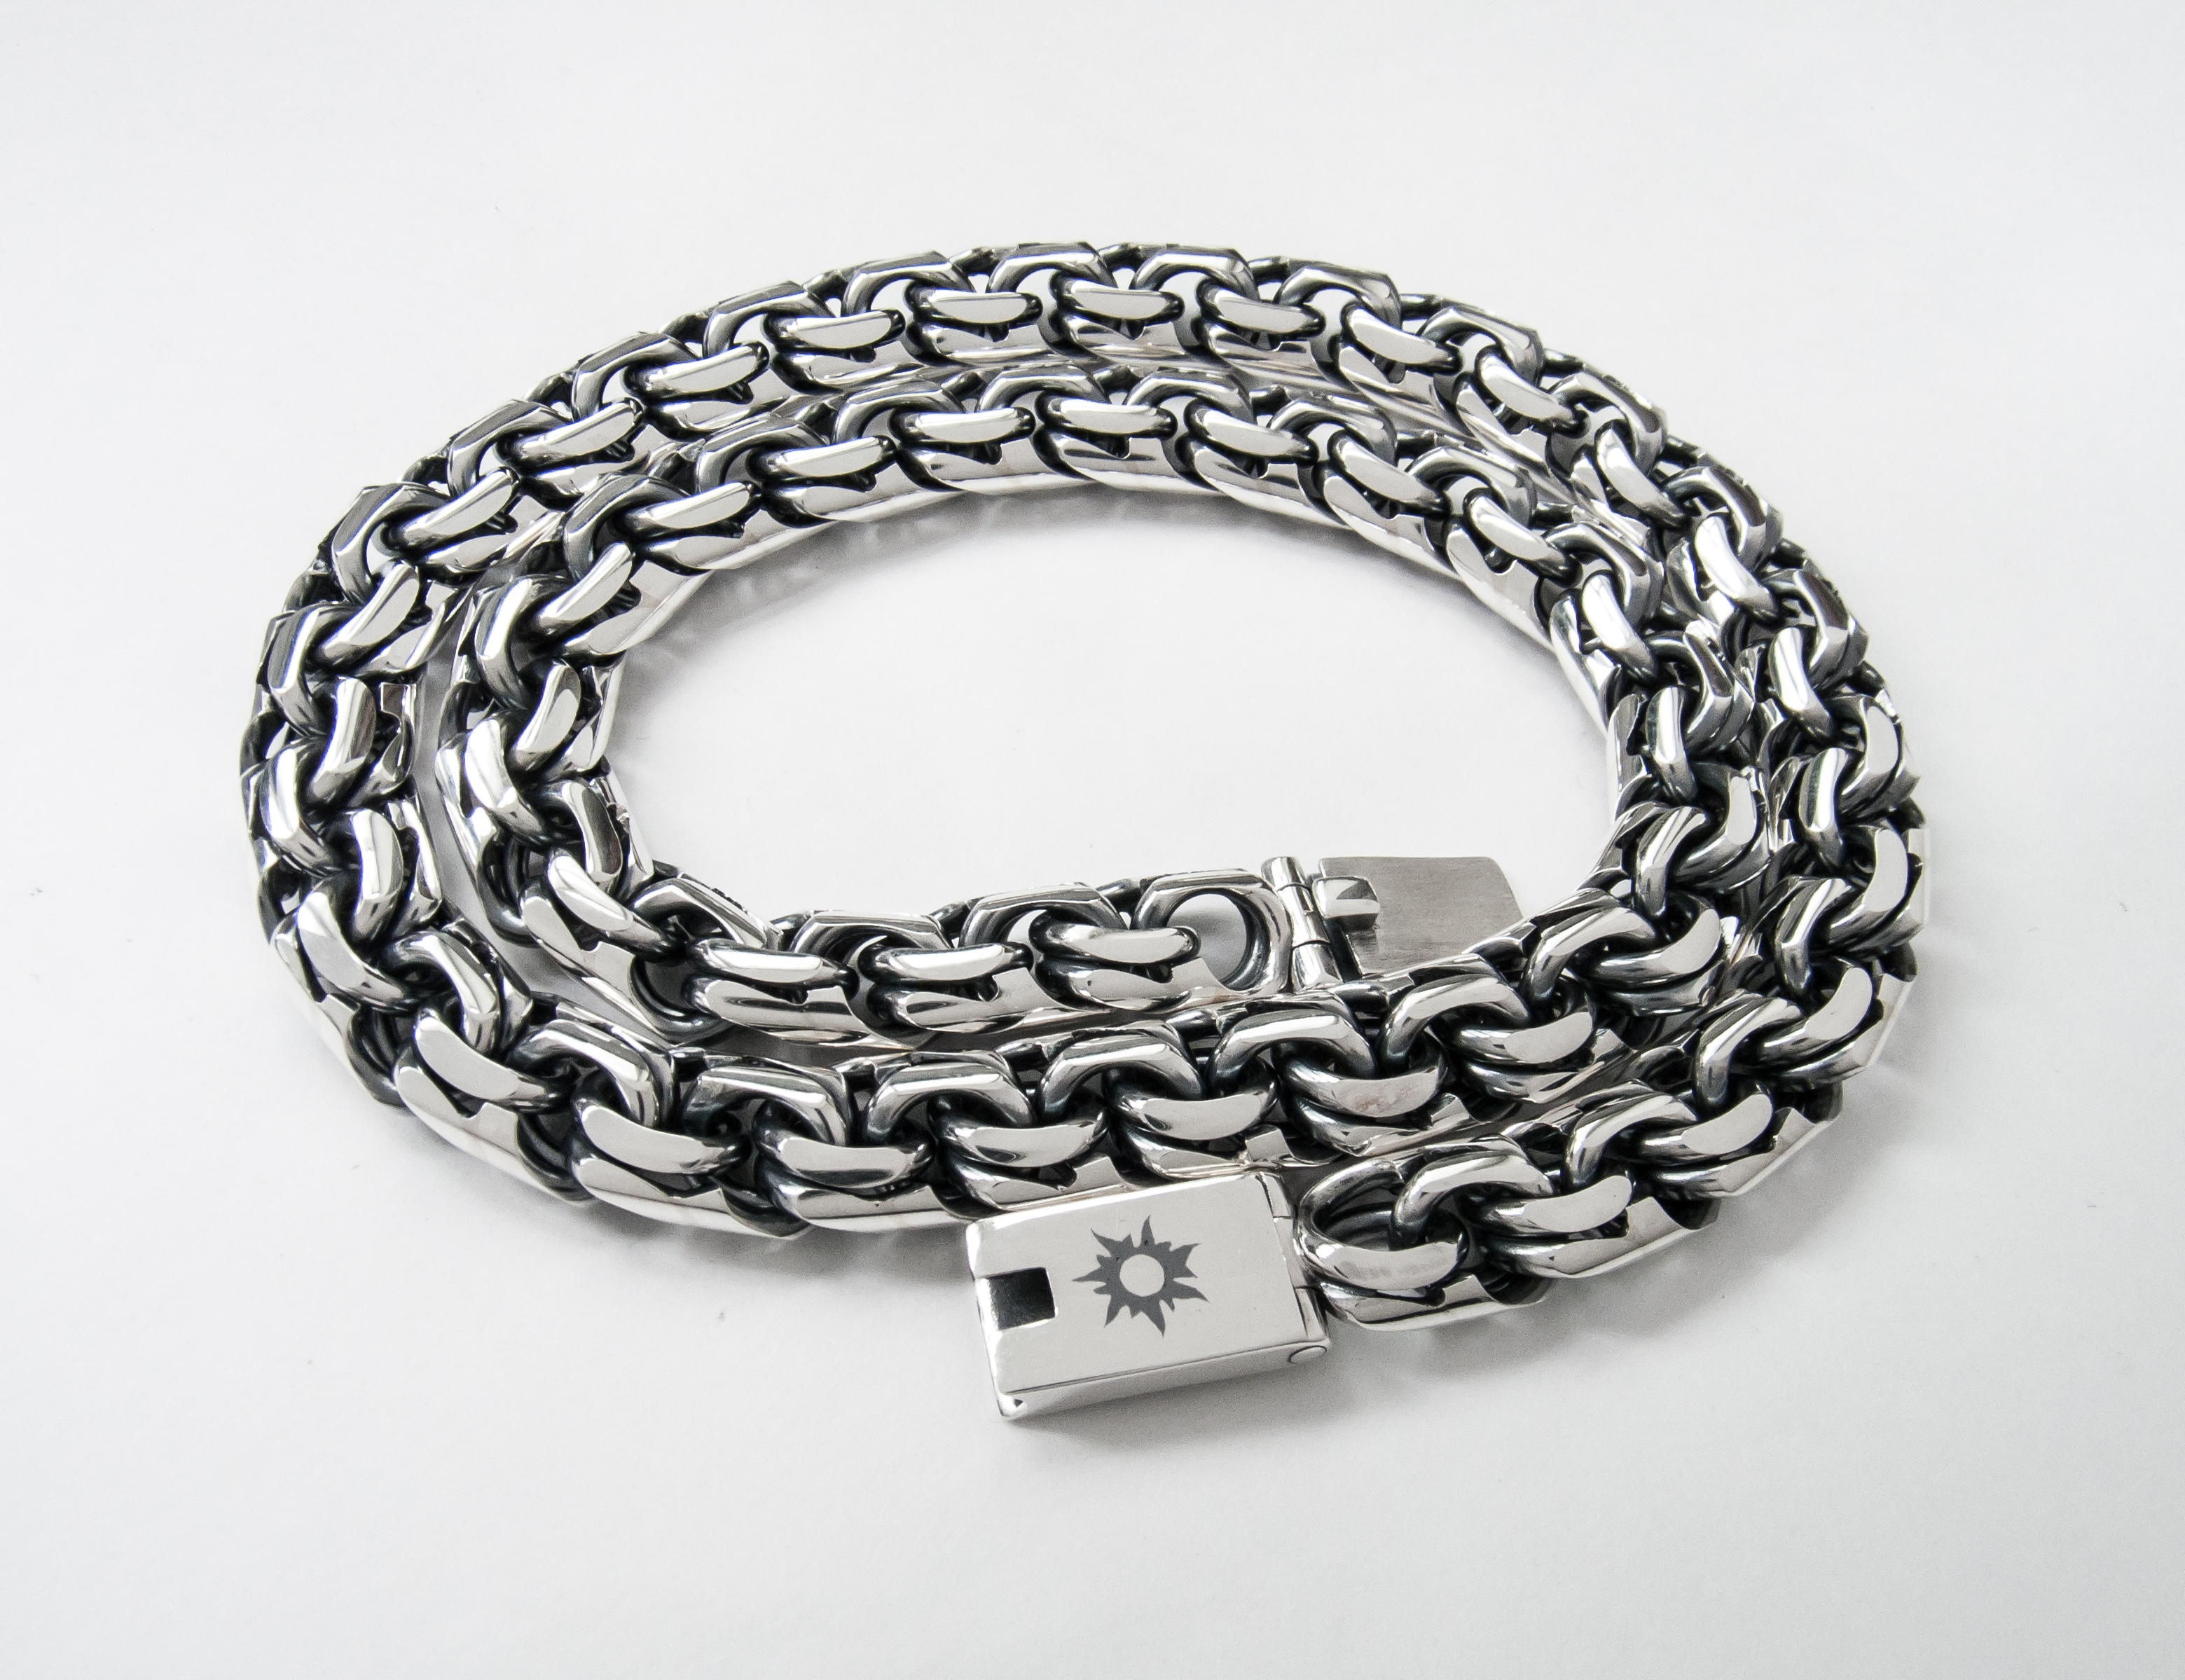 Гравировка на замке серебряной цепи символа солнца